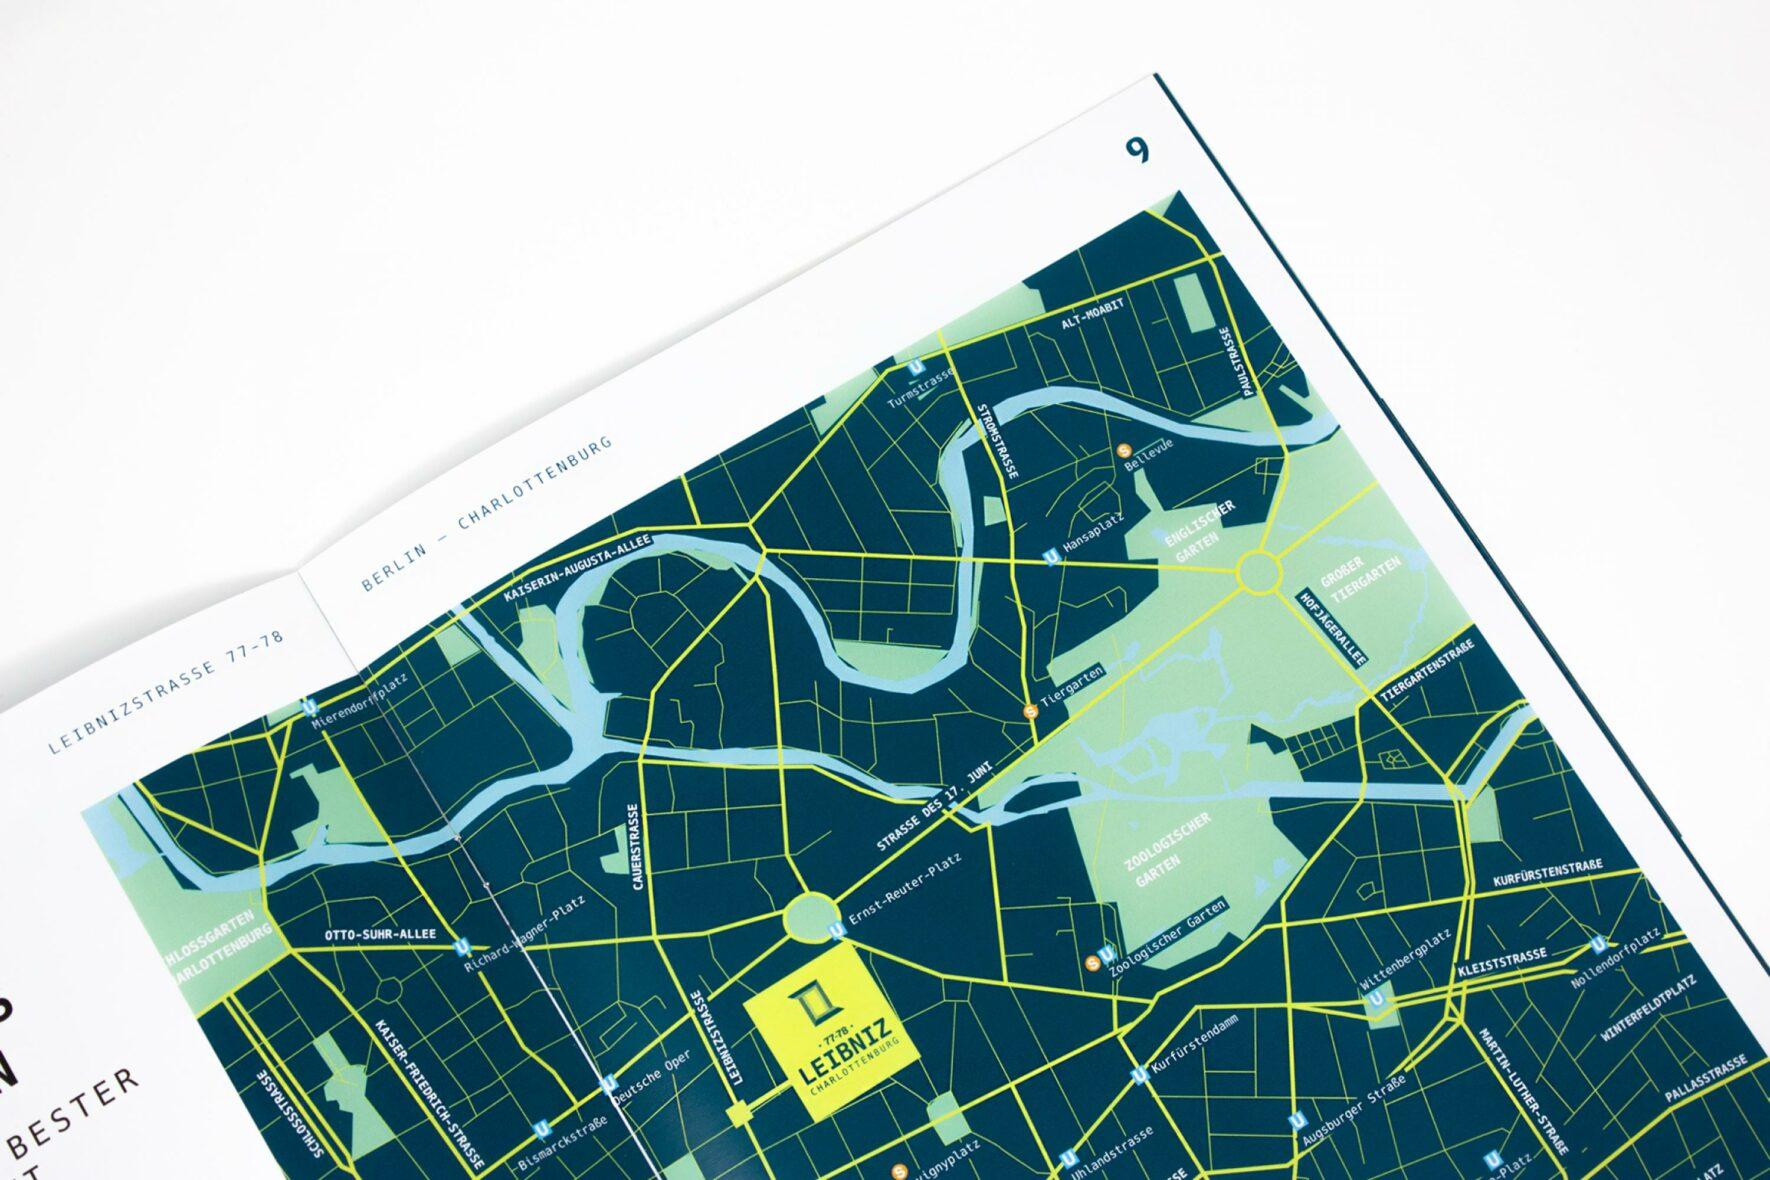 Broschuere-Leibniz-Immobilienbranding-Trendcity-FORMLOS-berlin-Print57